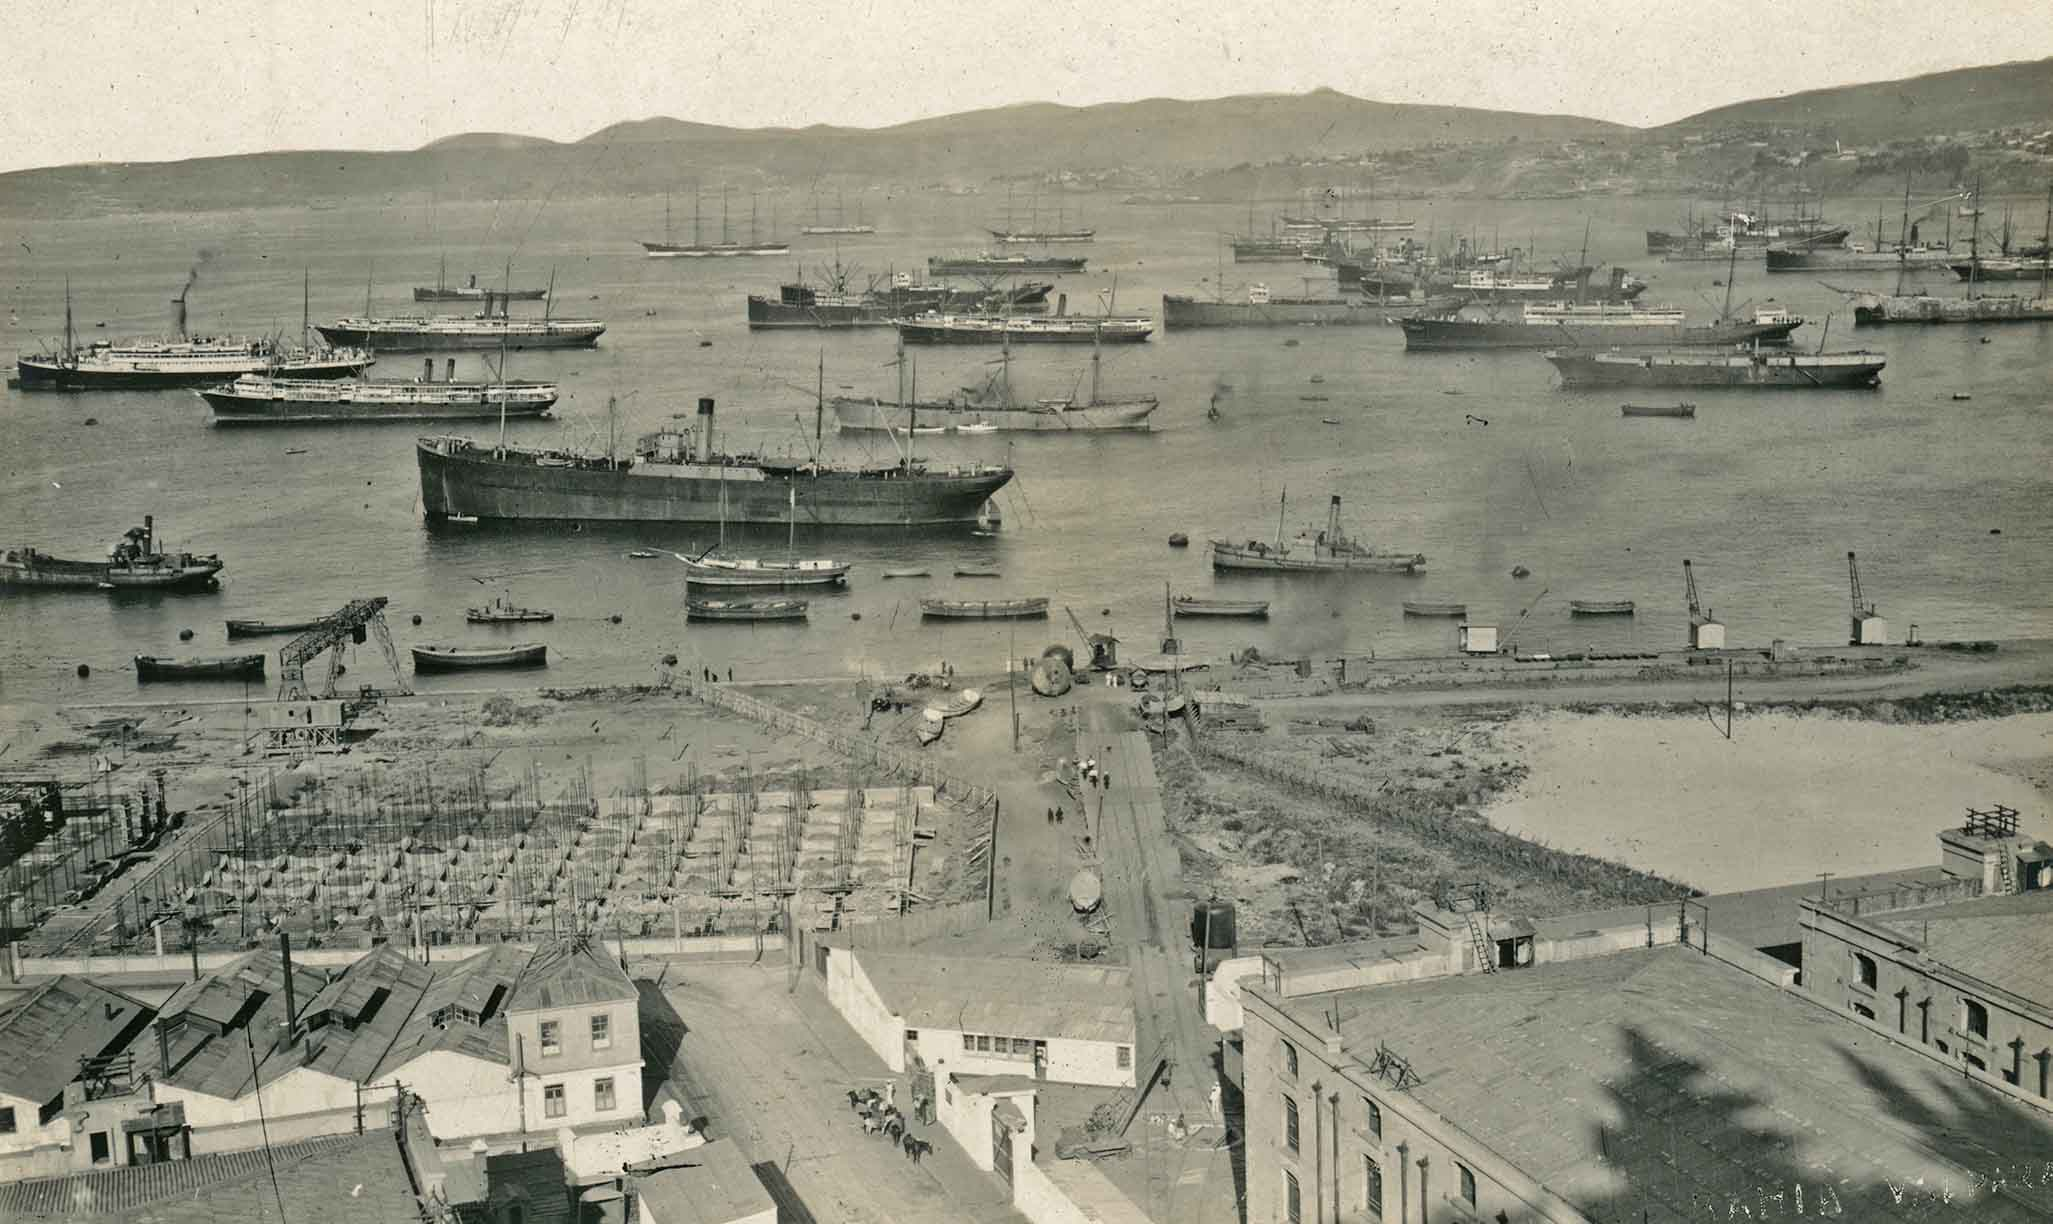 Enterreno - Fotos históricas de chile - fotos antiguas de Chile - Bahía de Valparaíso en 1919